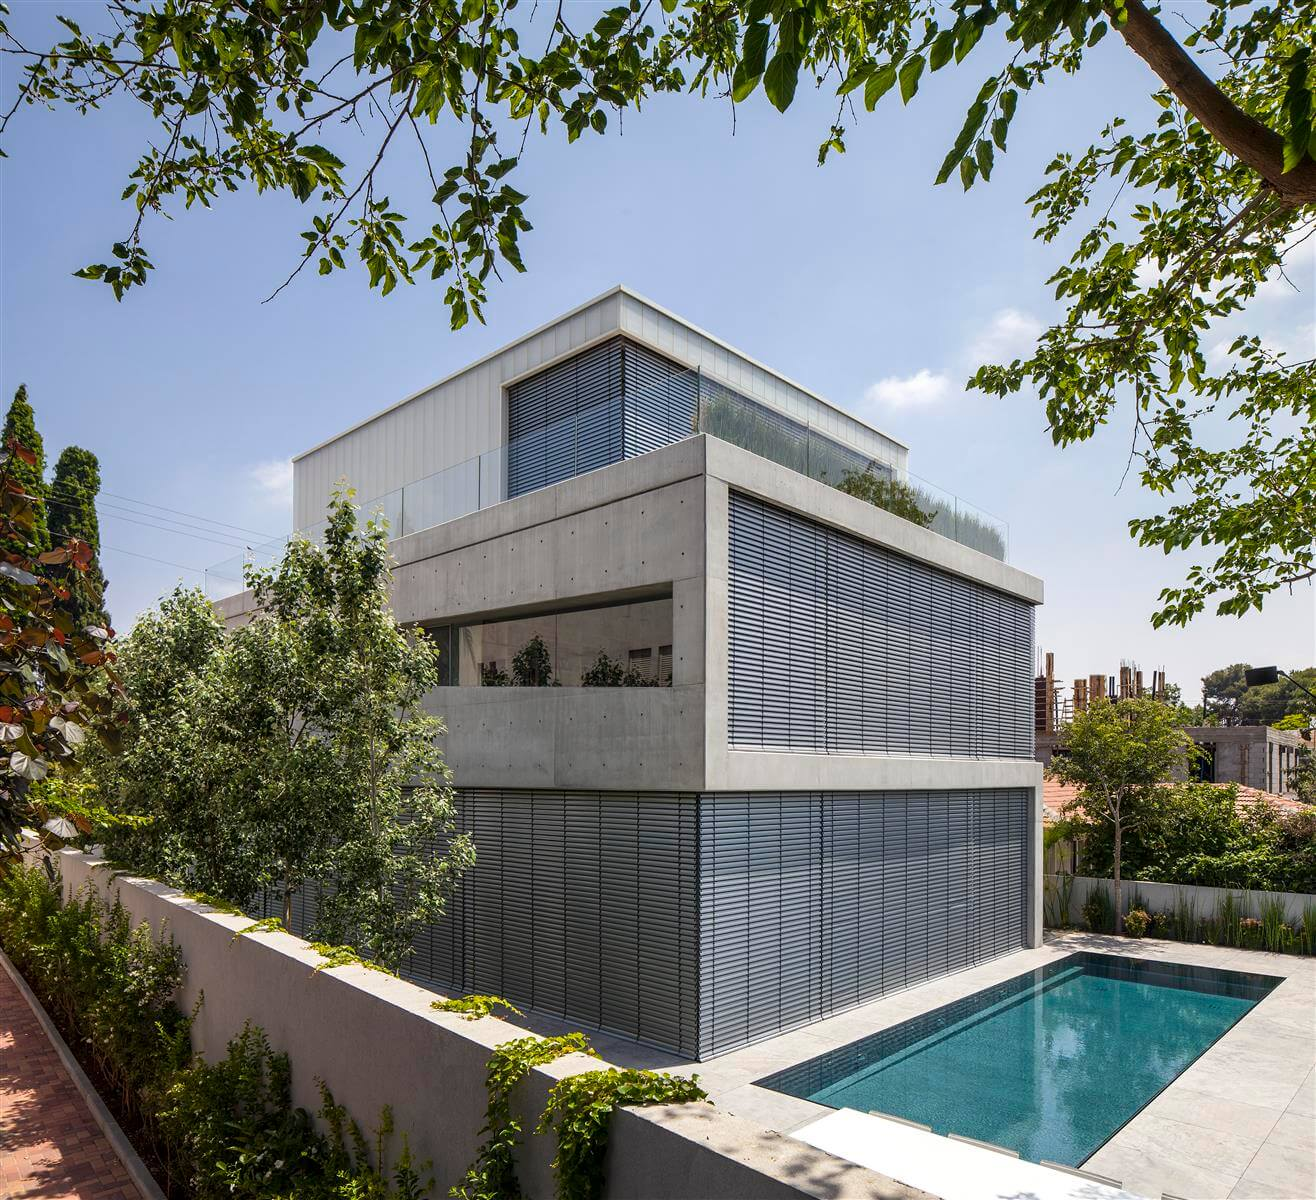 The Concrete Cut House in Ramat Gan by Pitsou Kedem Architects-12